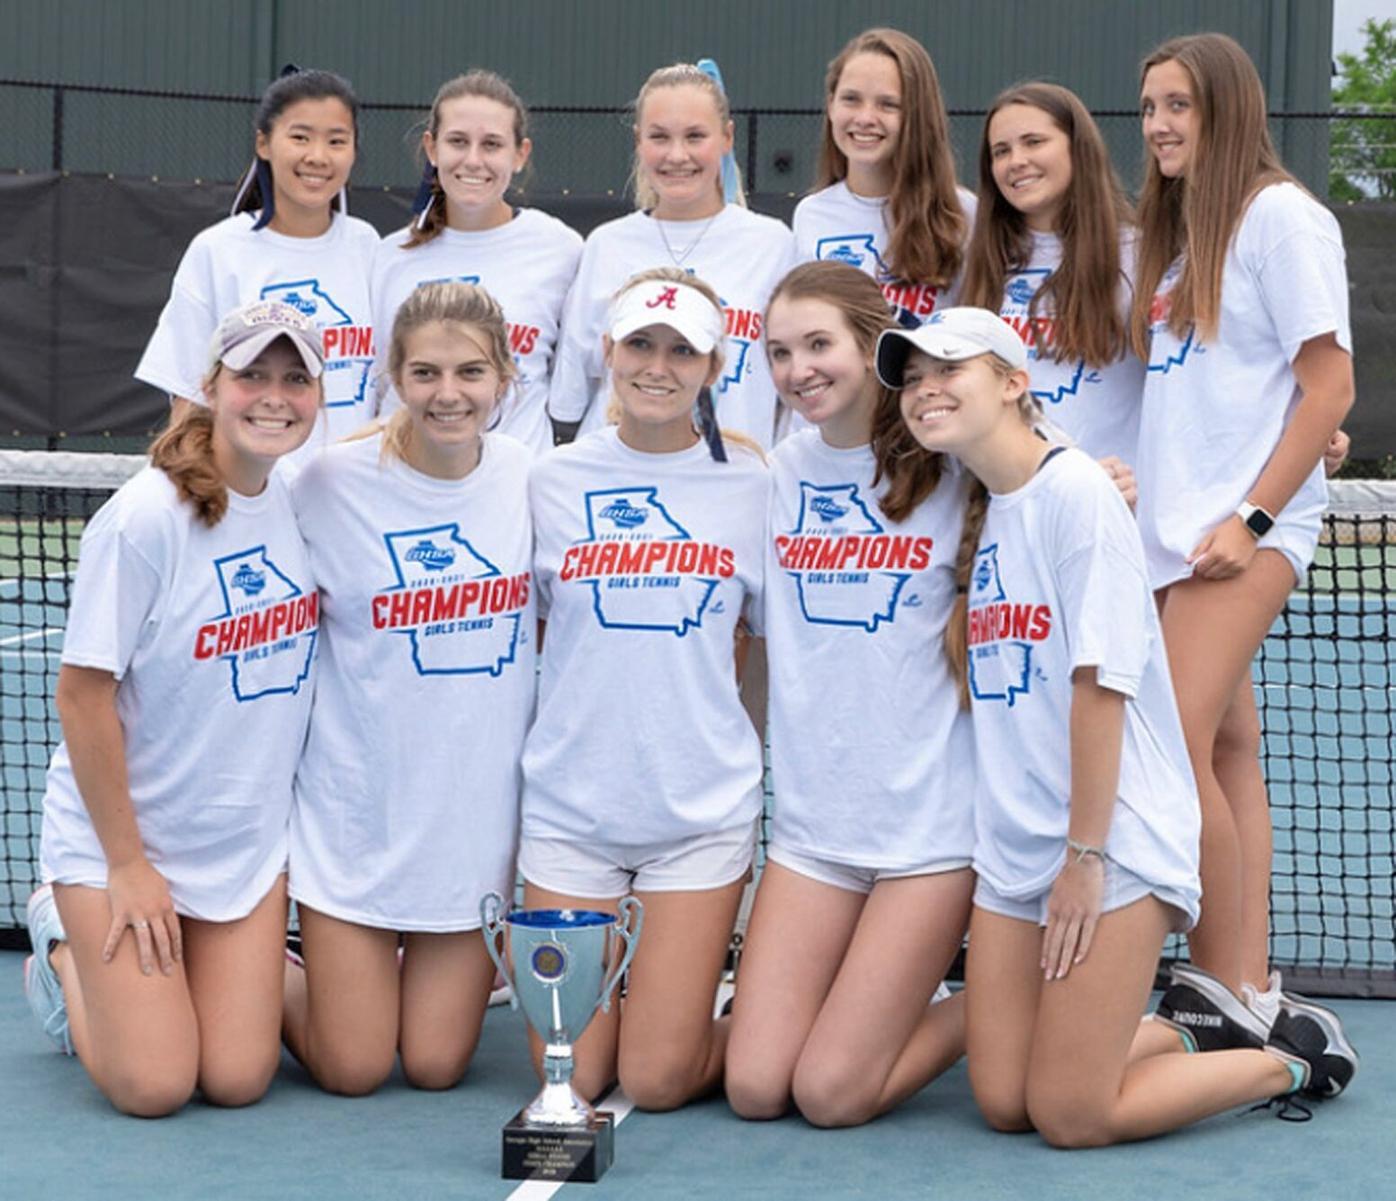 051921_MNS_state_tennis_007 Cambridge girls' tennis team group